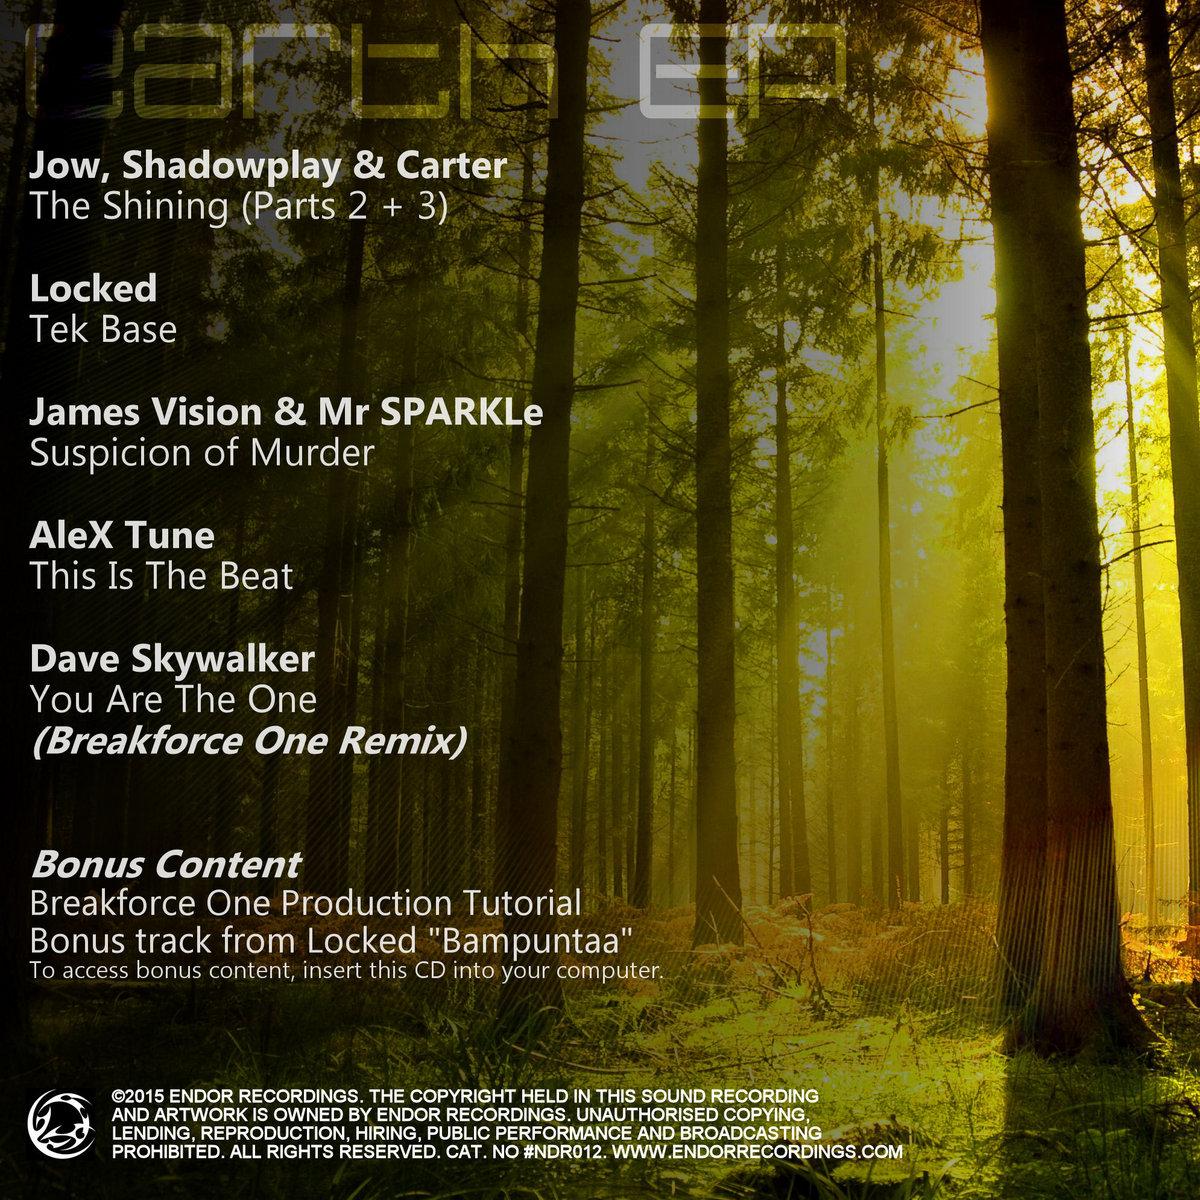 Earth EP (NDR012) | Endor Recordings